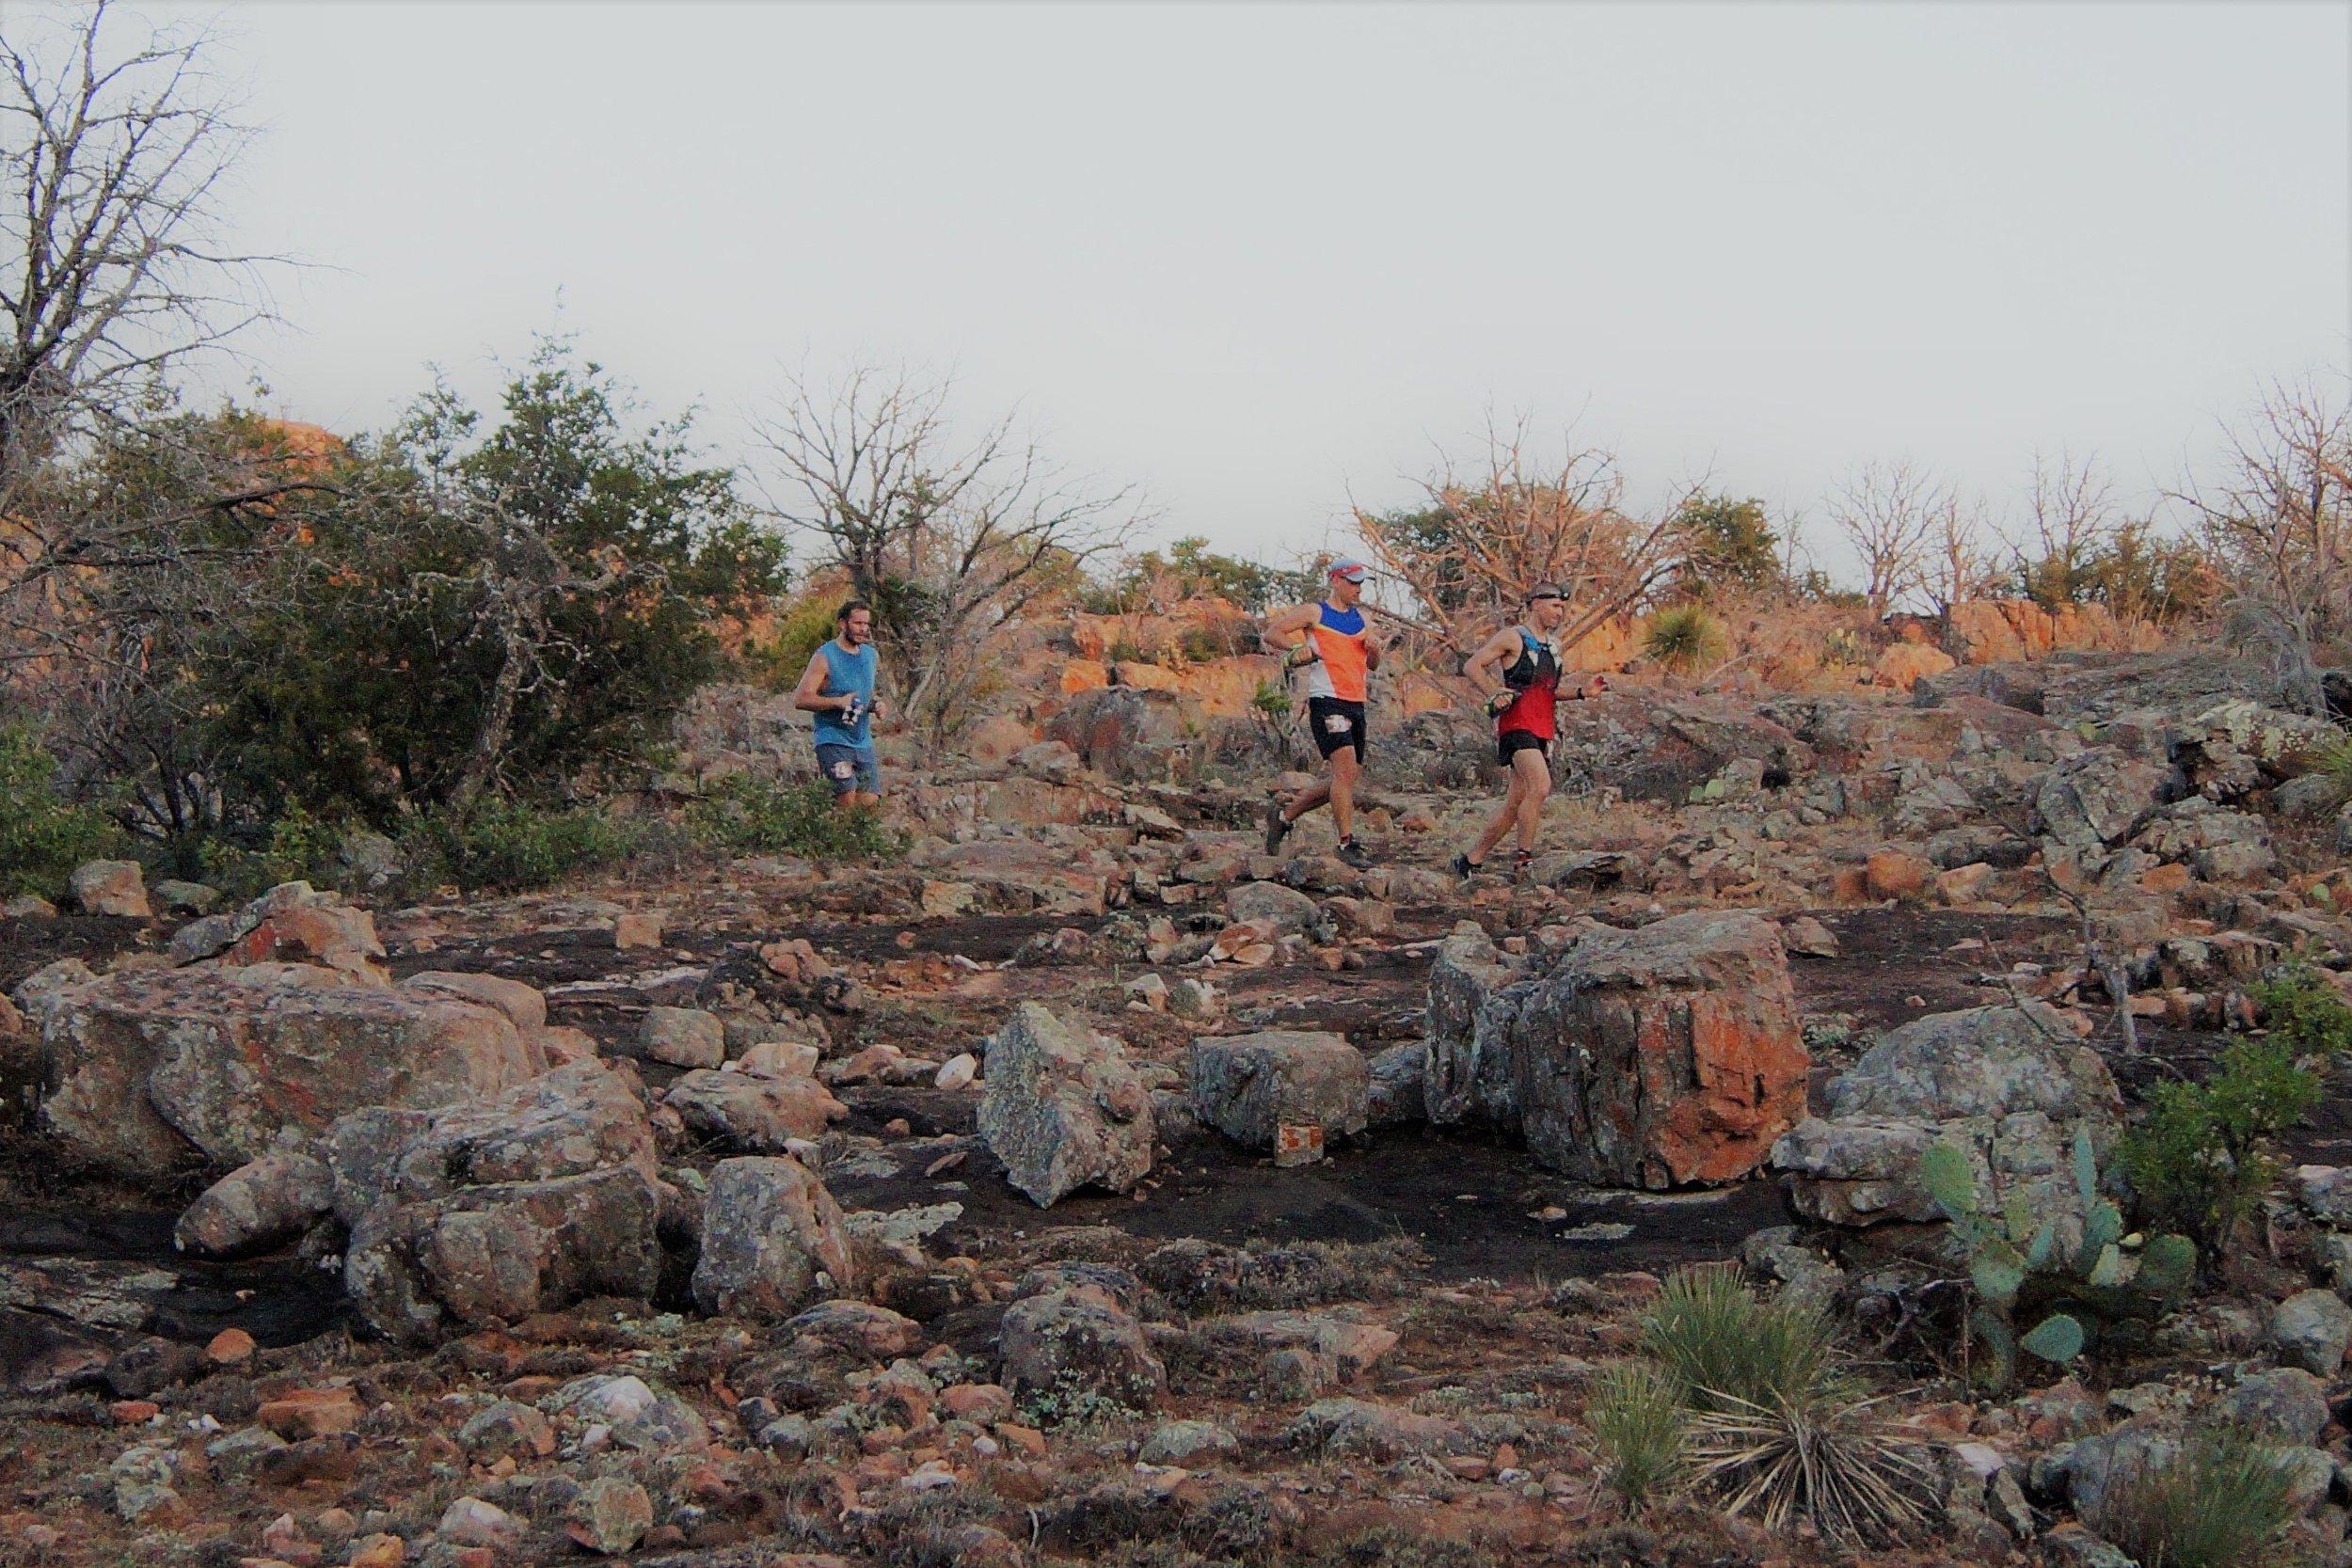 Pandora's Box of Rox - 4 Miler . 8 Miler . Half Marathon (13.1 mi) . Marathon (26.2 mi) . Double Marathon (52.4 mi)Apr 27, 2019